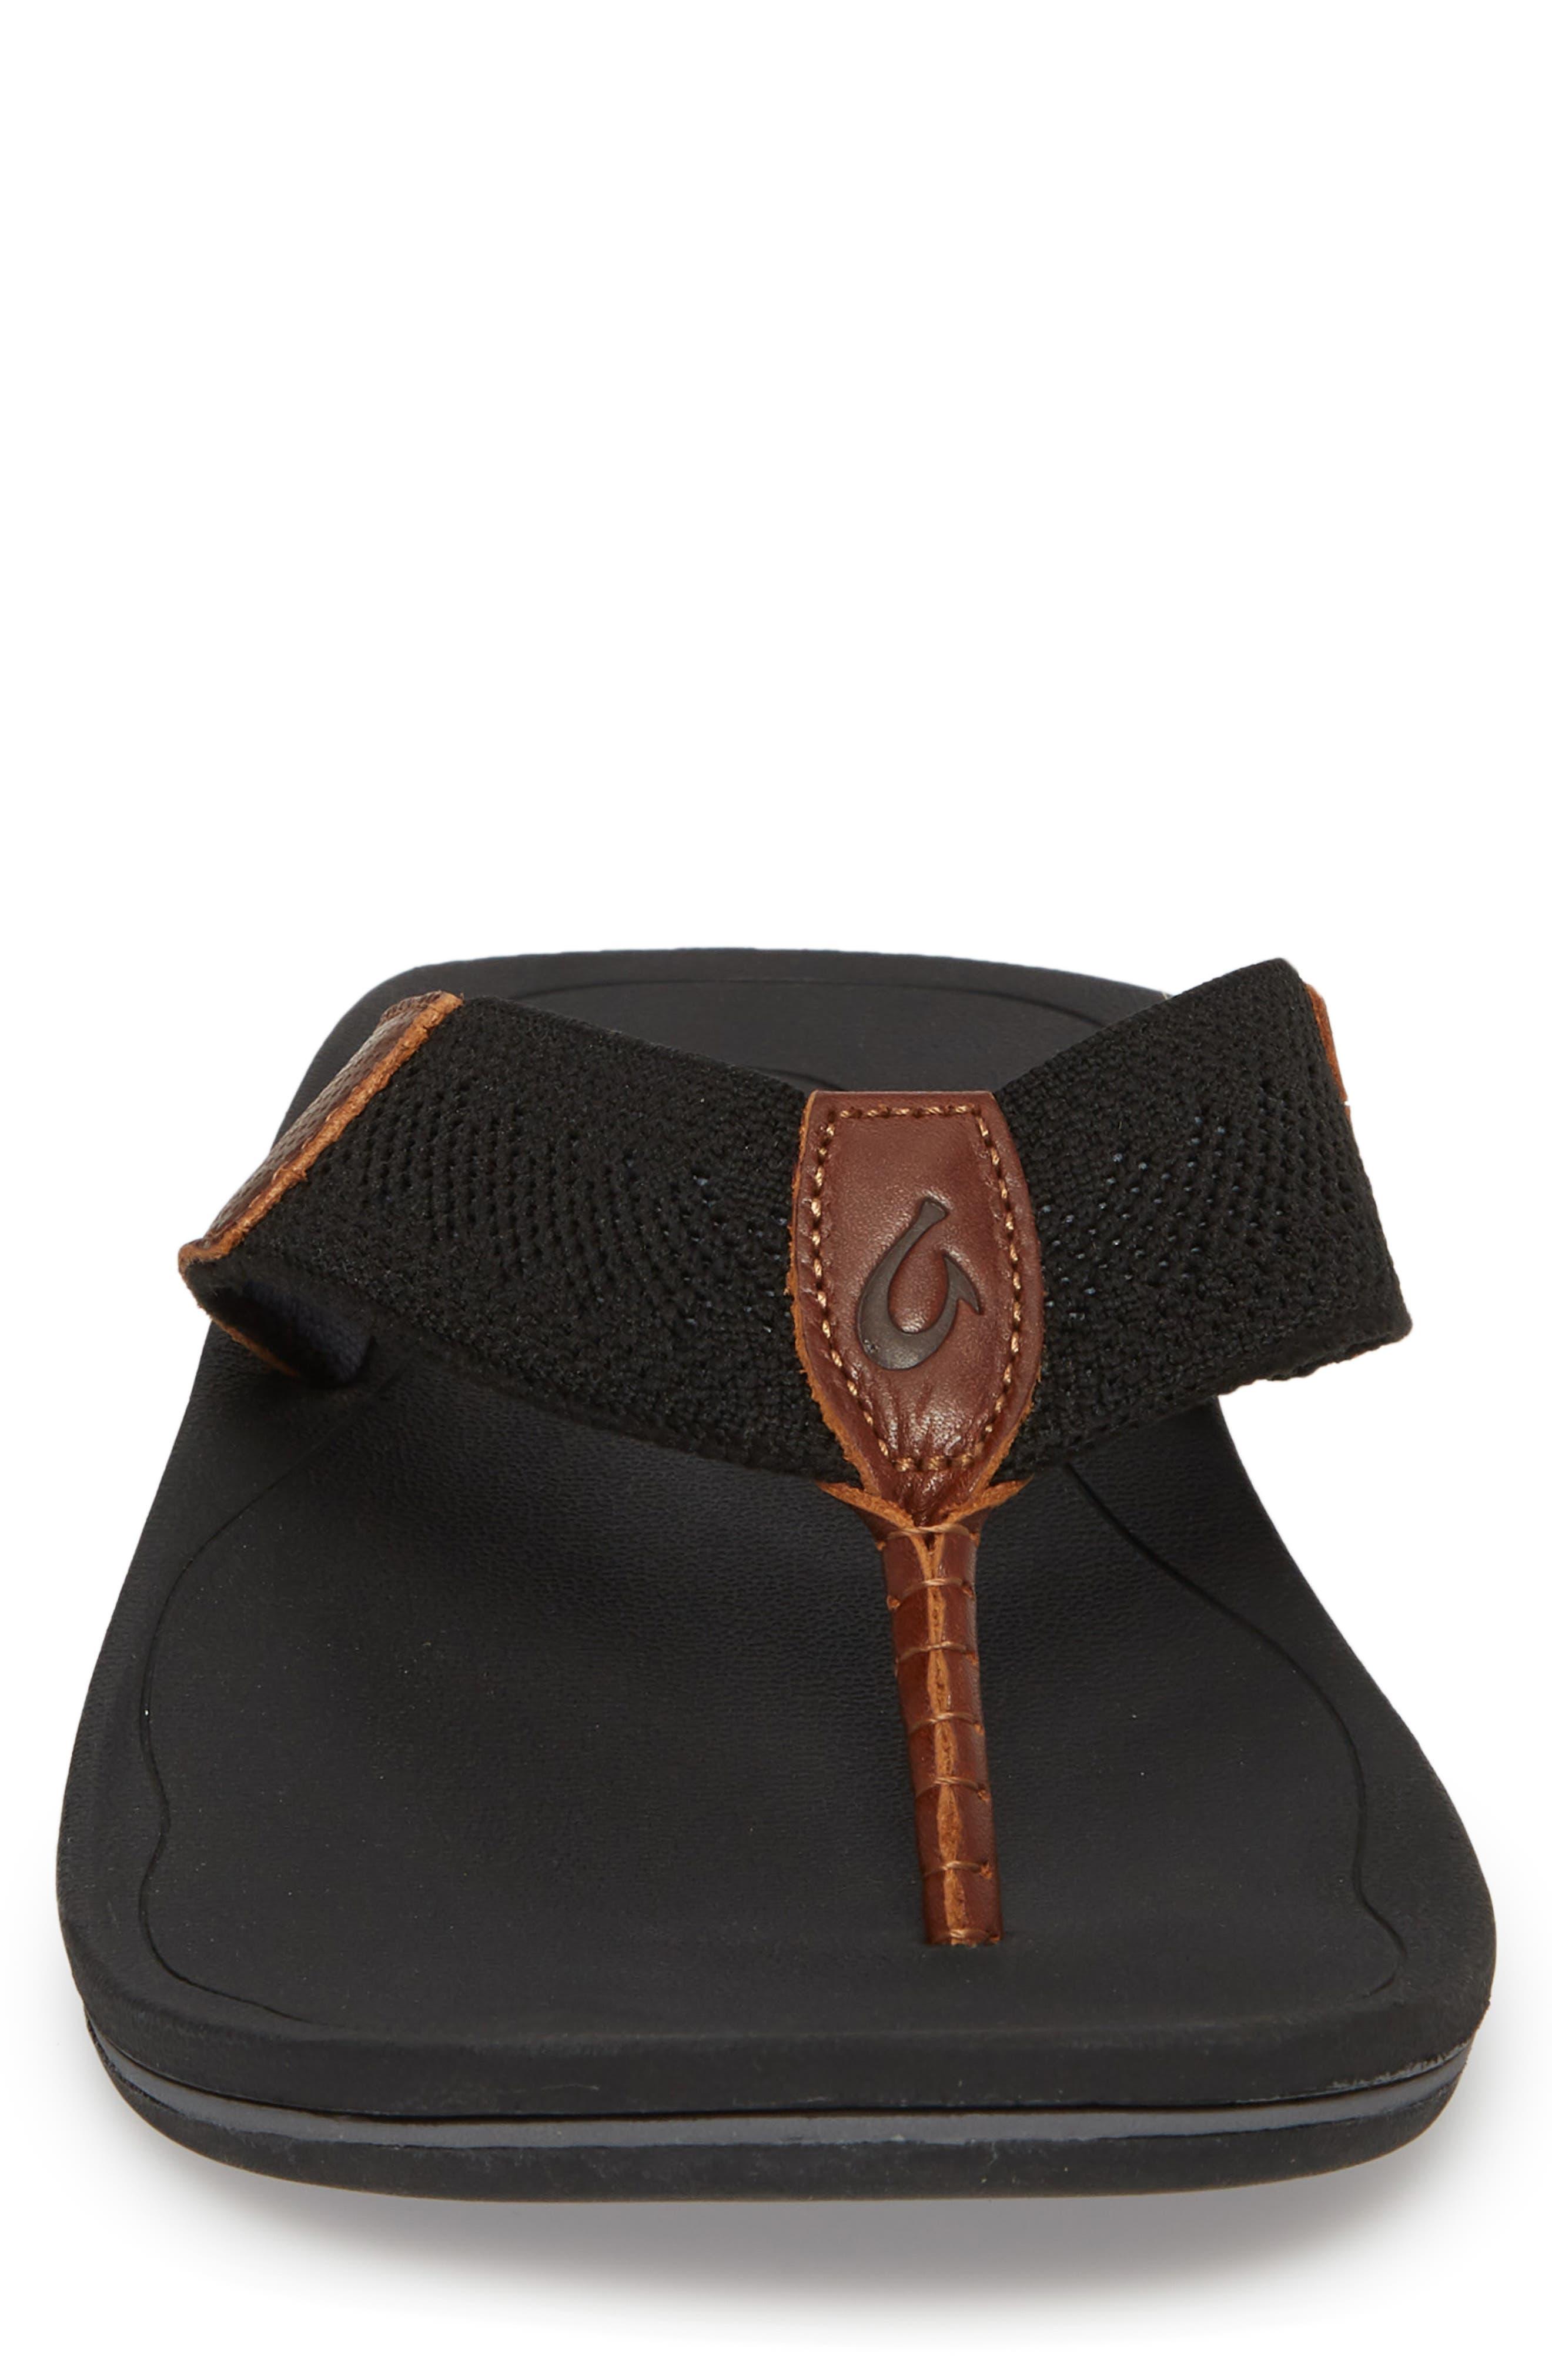 Nohona Ulana Flip Flop,                             Alternate thumbnail 4, color,                             Black/ Black Leather